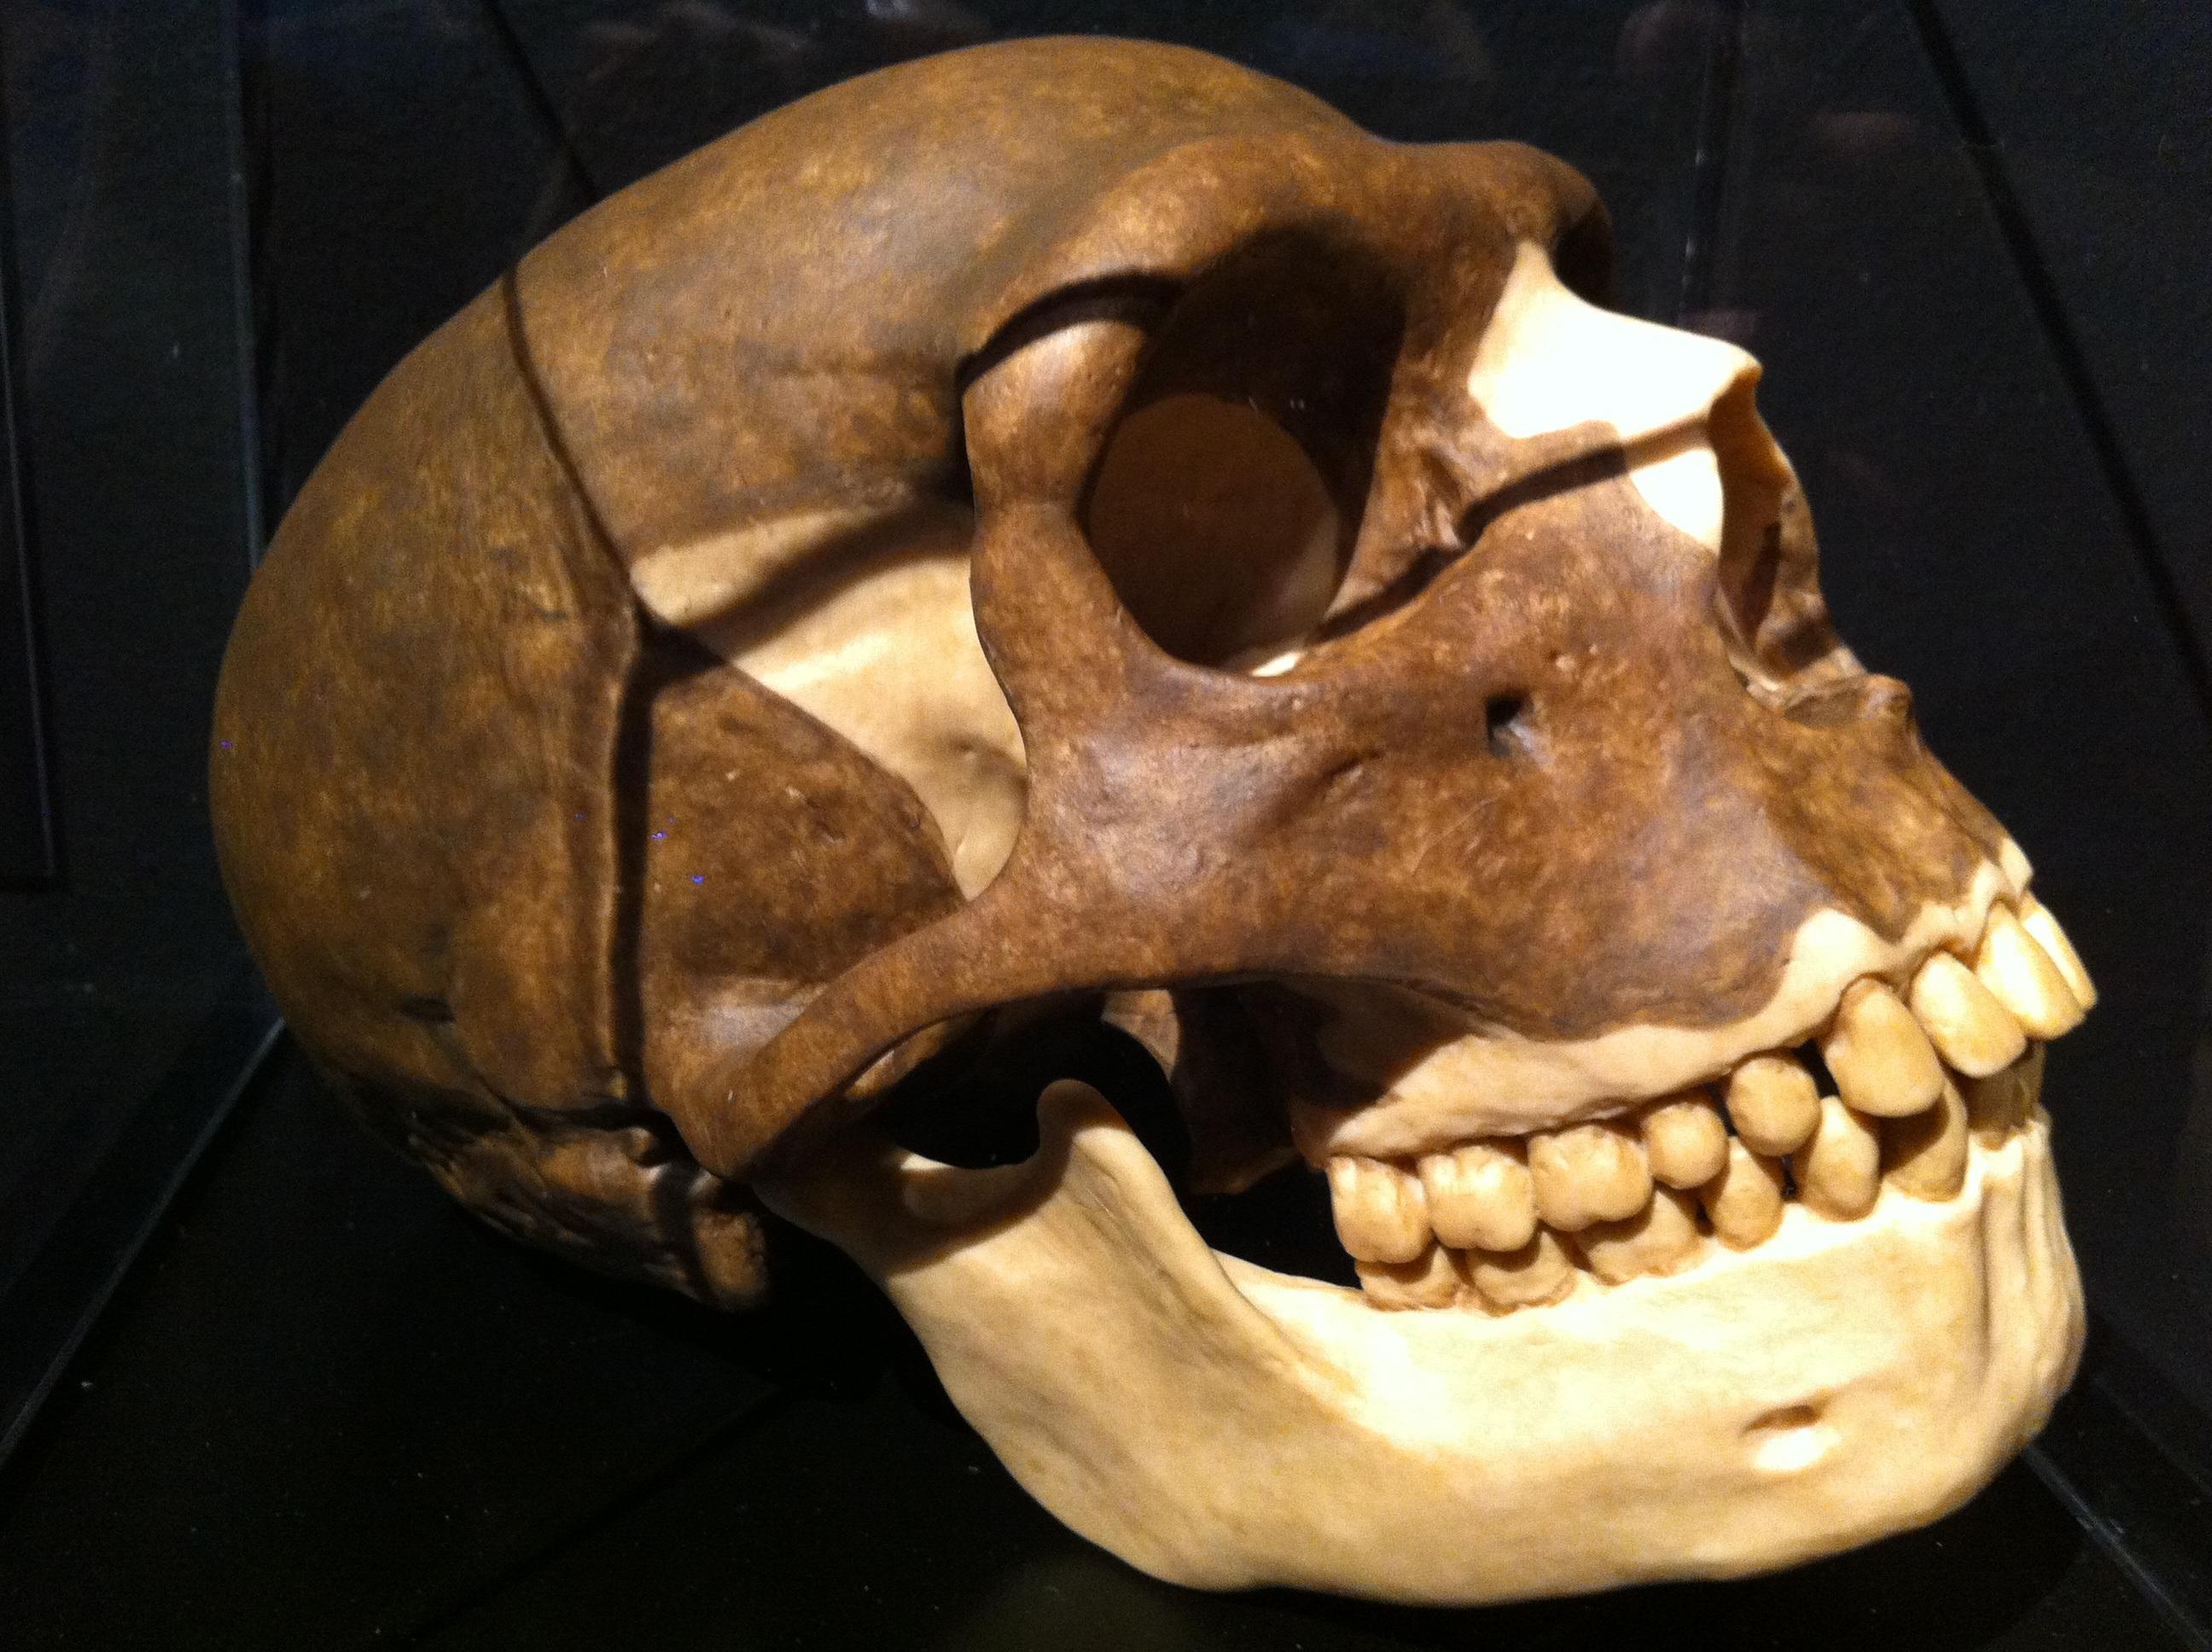 Free Images Museum Skull Bone Sculpture Art History Skeleton Carving Prehistoric Jaw 2592x1936 1049736 Free Stock Photos Pxhere